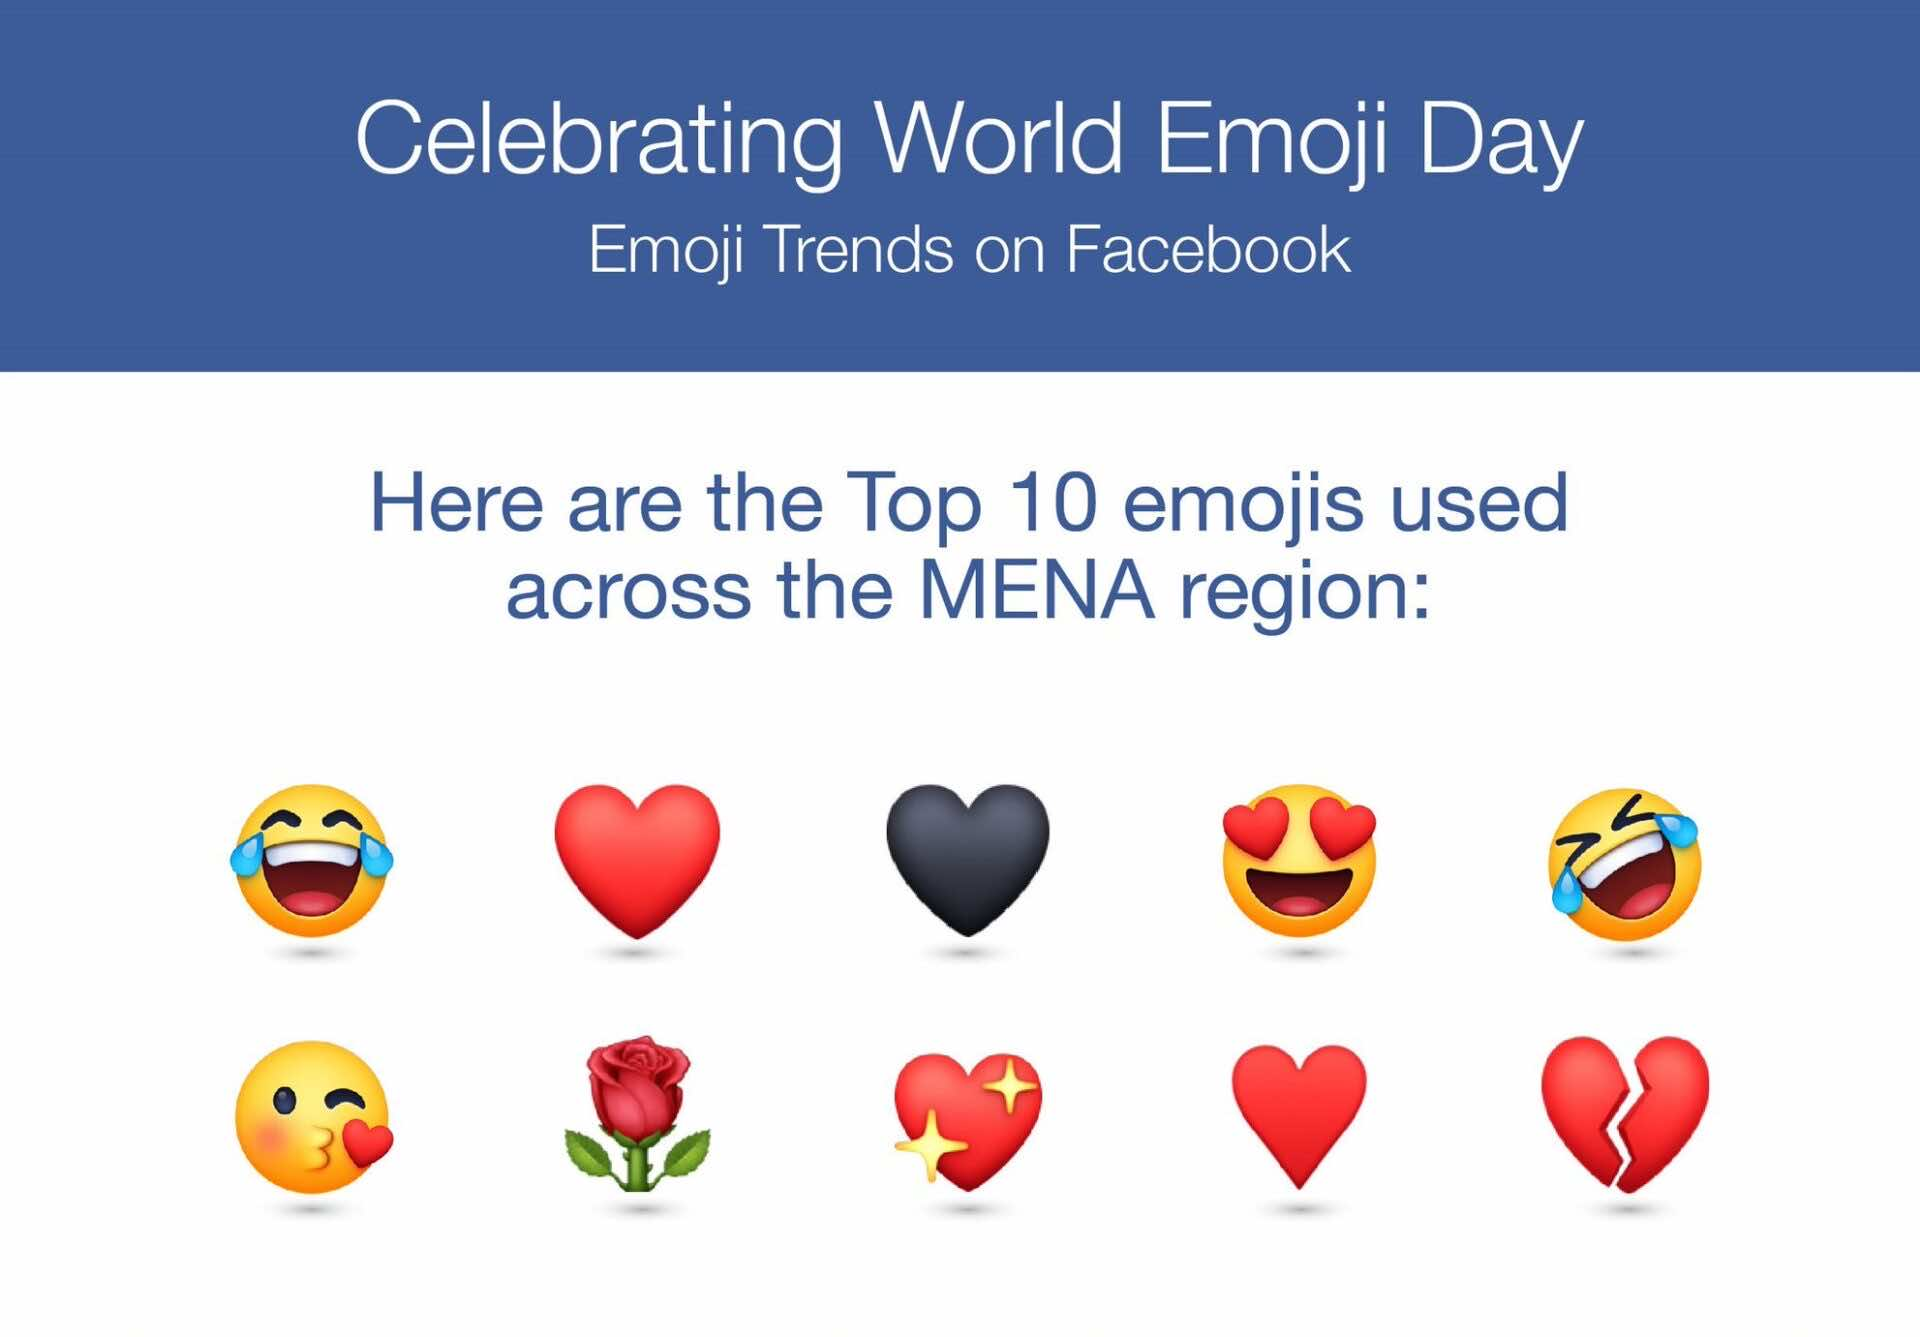 Facebook Reveals Top Emojis in MENA, Celebrates World Emoji Day